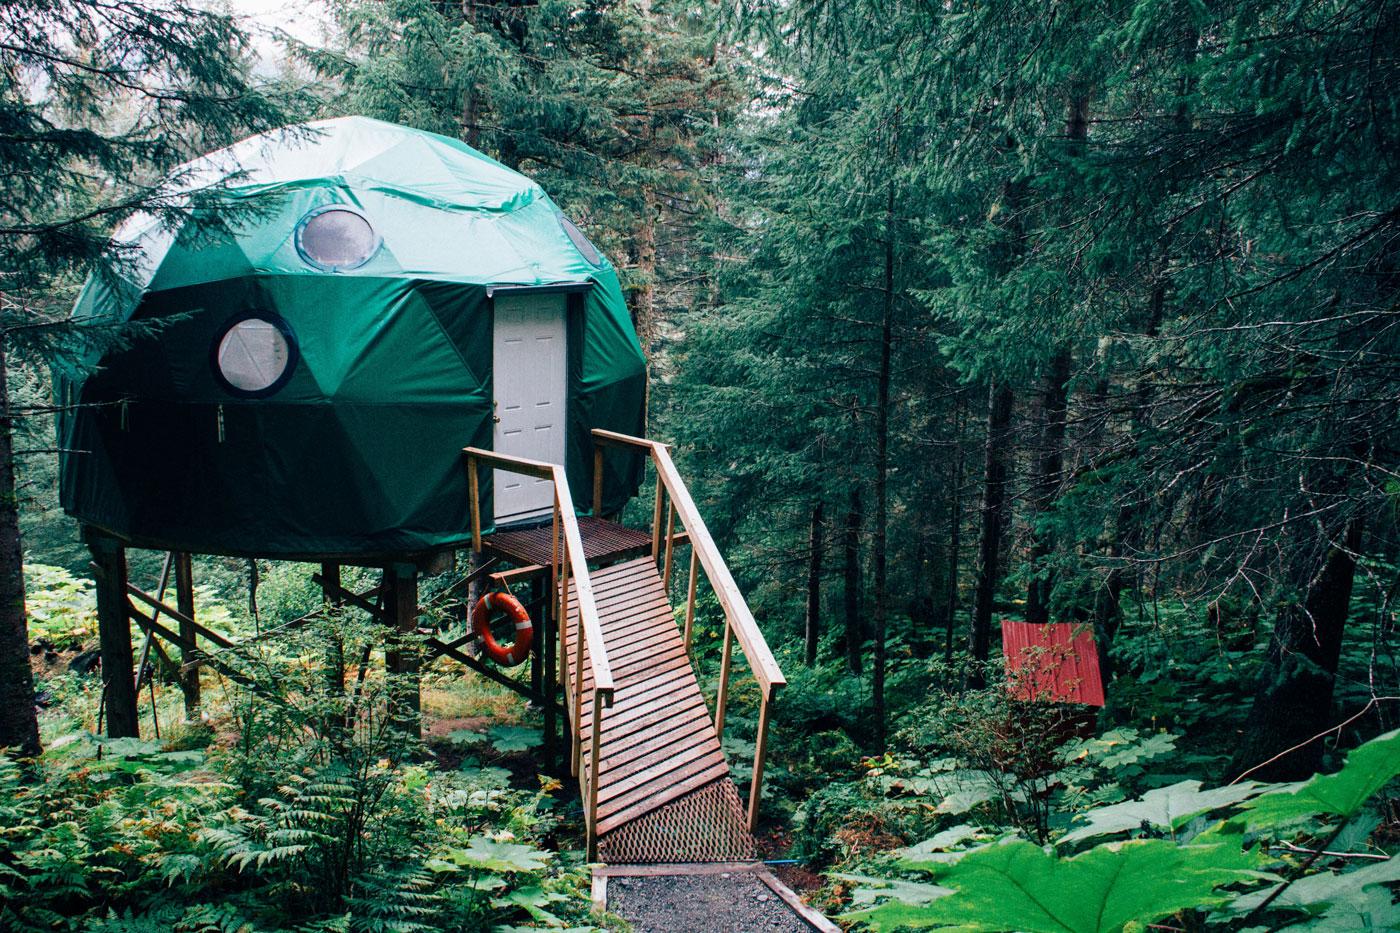 🏡 Airbnb ogolosyla konkurs z pryzovym fondom $ 1 mln na najnezvyčnišyj budynok dlja gostej